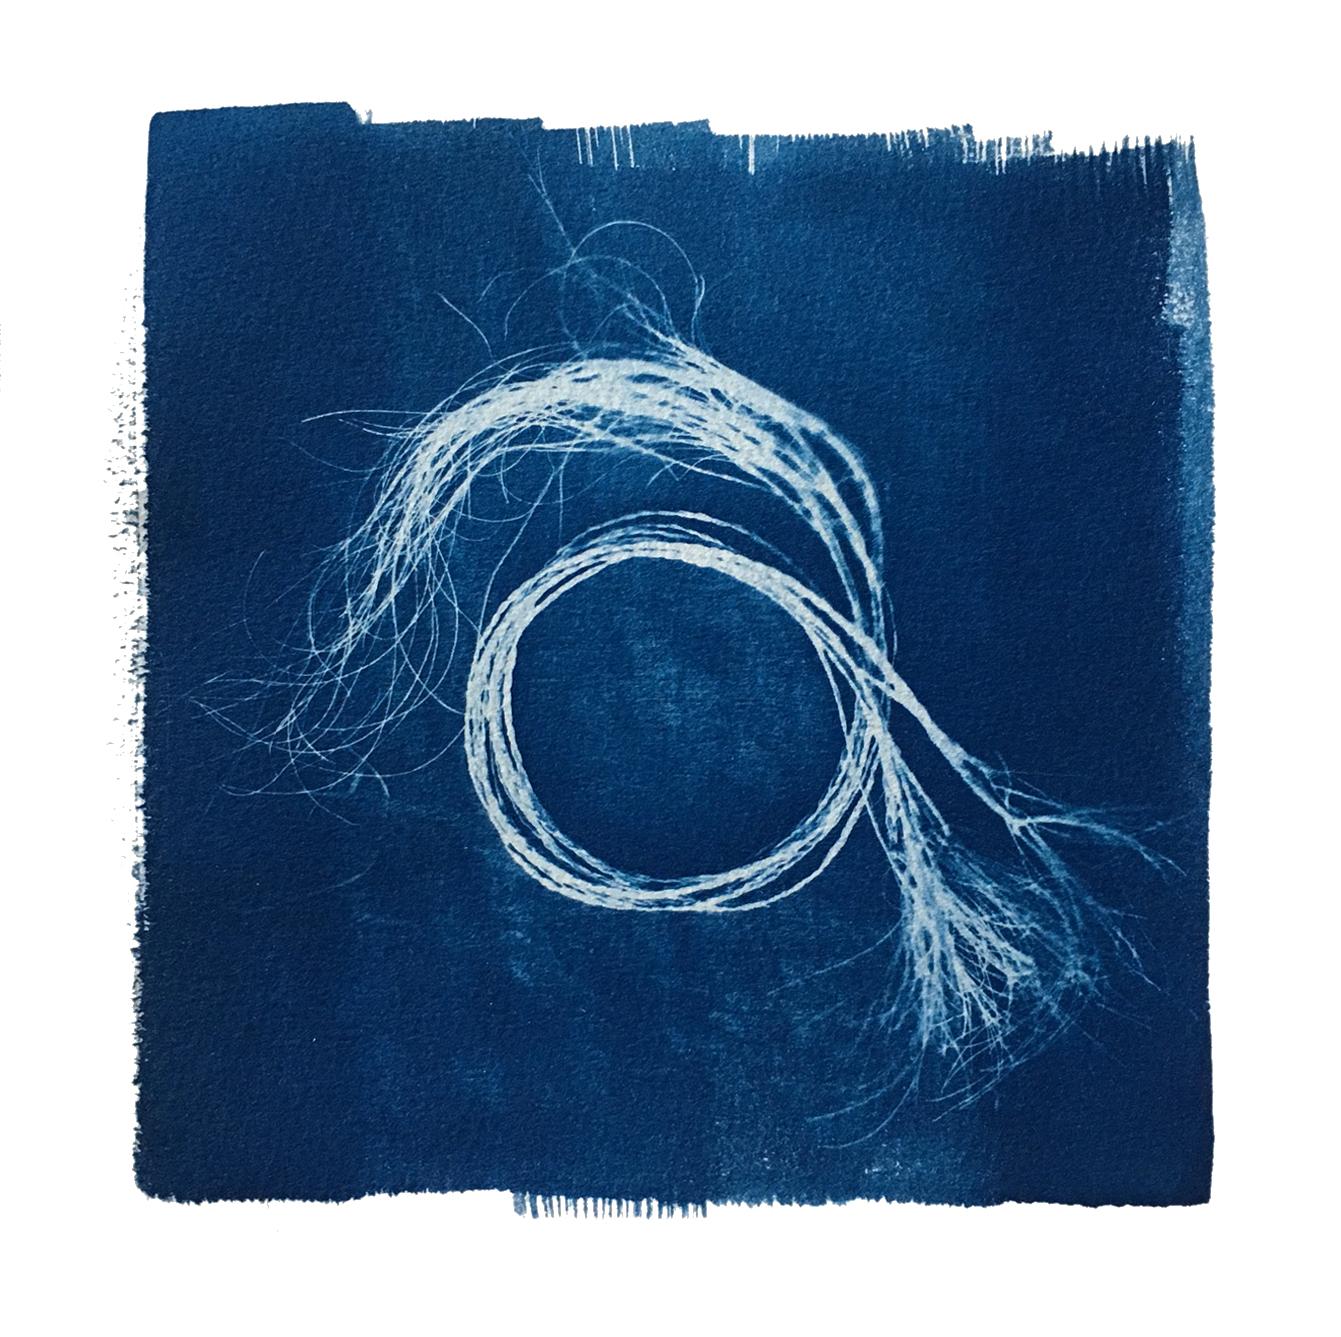 "TITLE /  Plaited Sabal Minor, No. 1  MEDIUM /  Cyanotype Print, Printed on 100% Cotton Paper  SIZE /  9"" x 9""  PRICE /  $275.00"